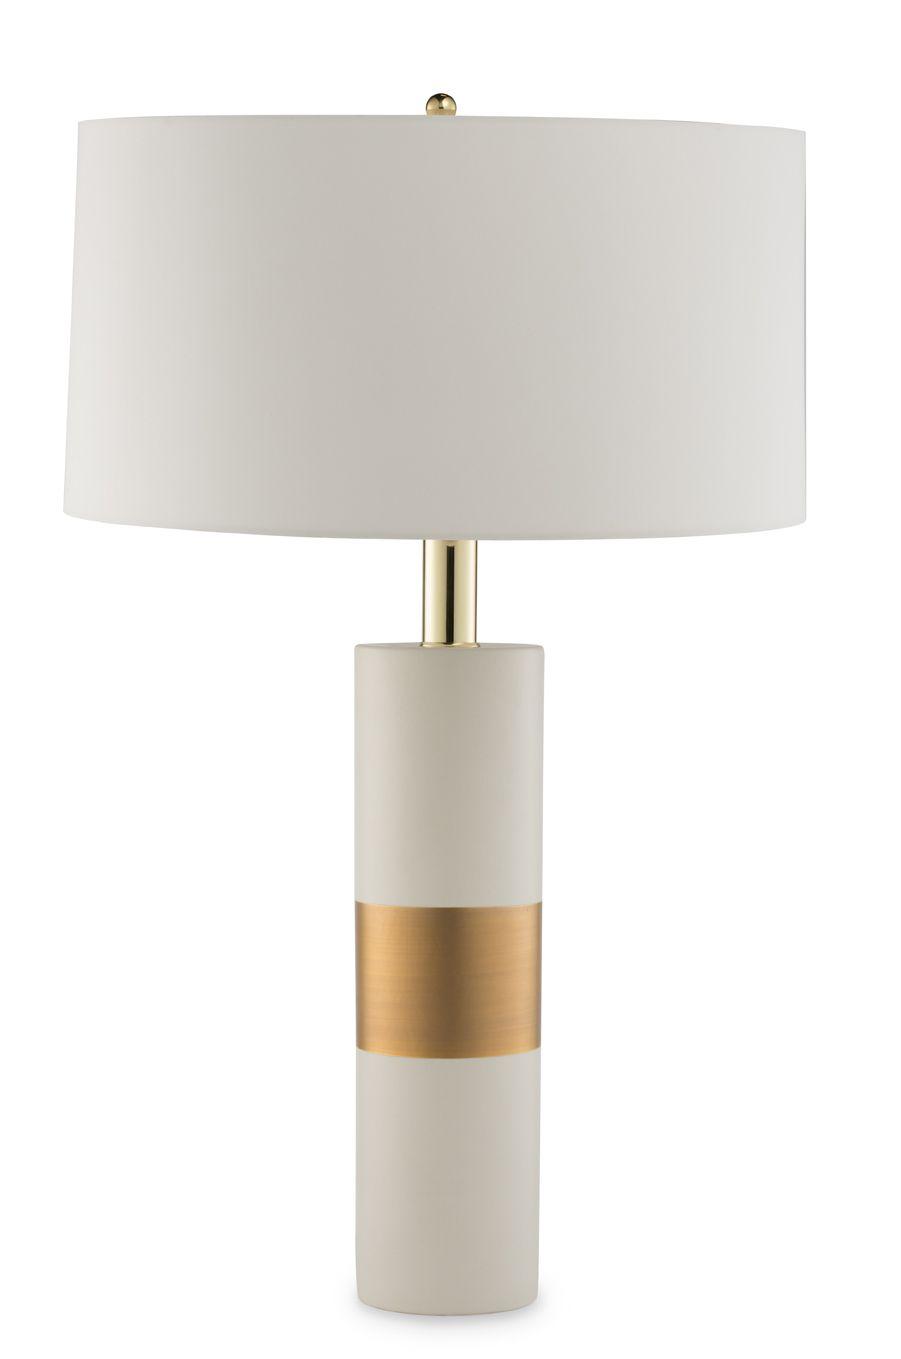 Verdure Obi Lamp Table Lamp Table lamps offer the